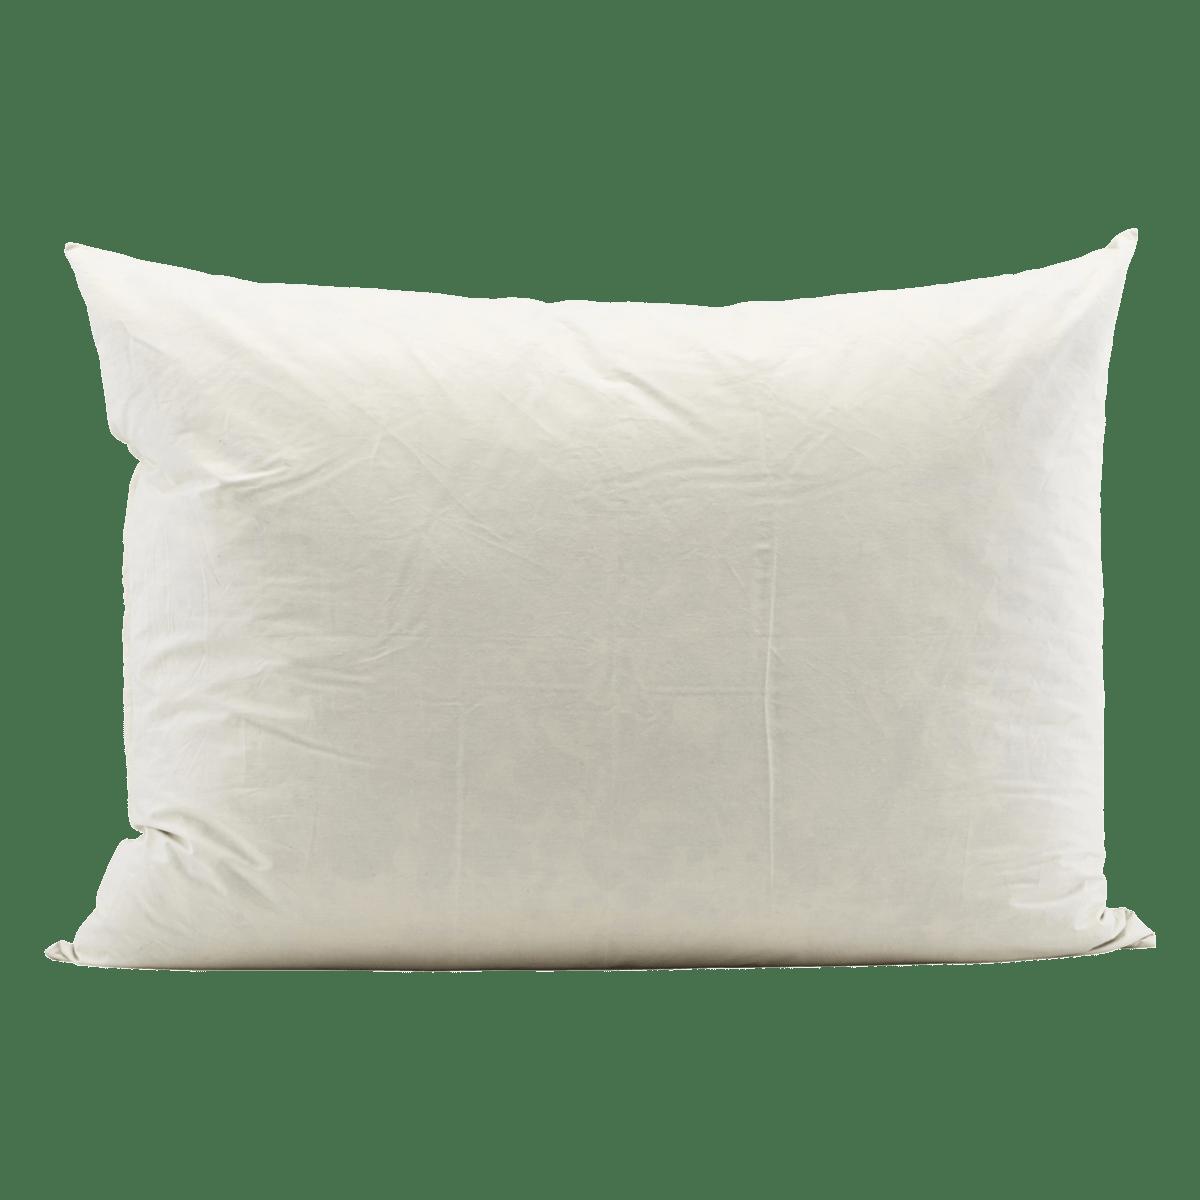 Bílý polštář 60x80 cm